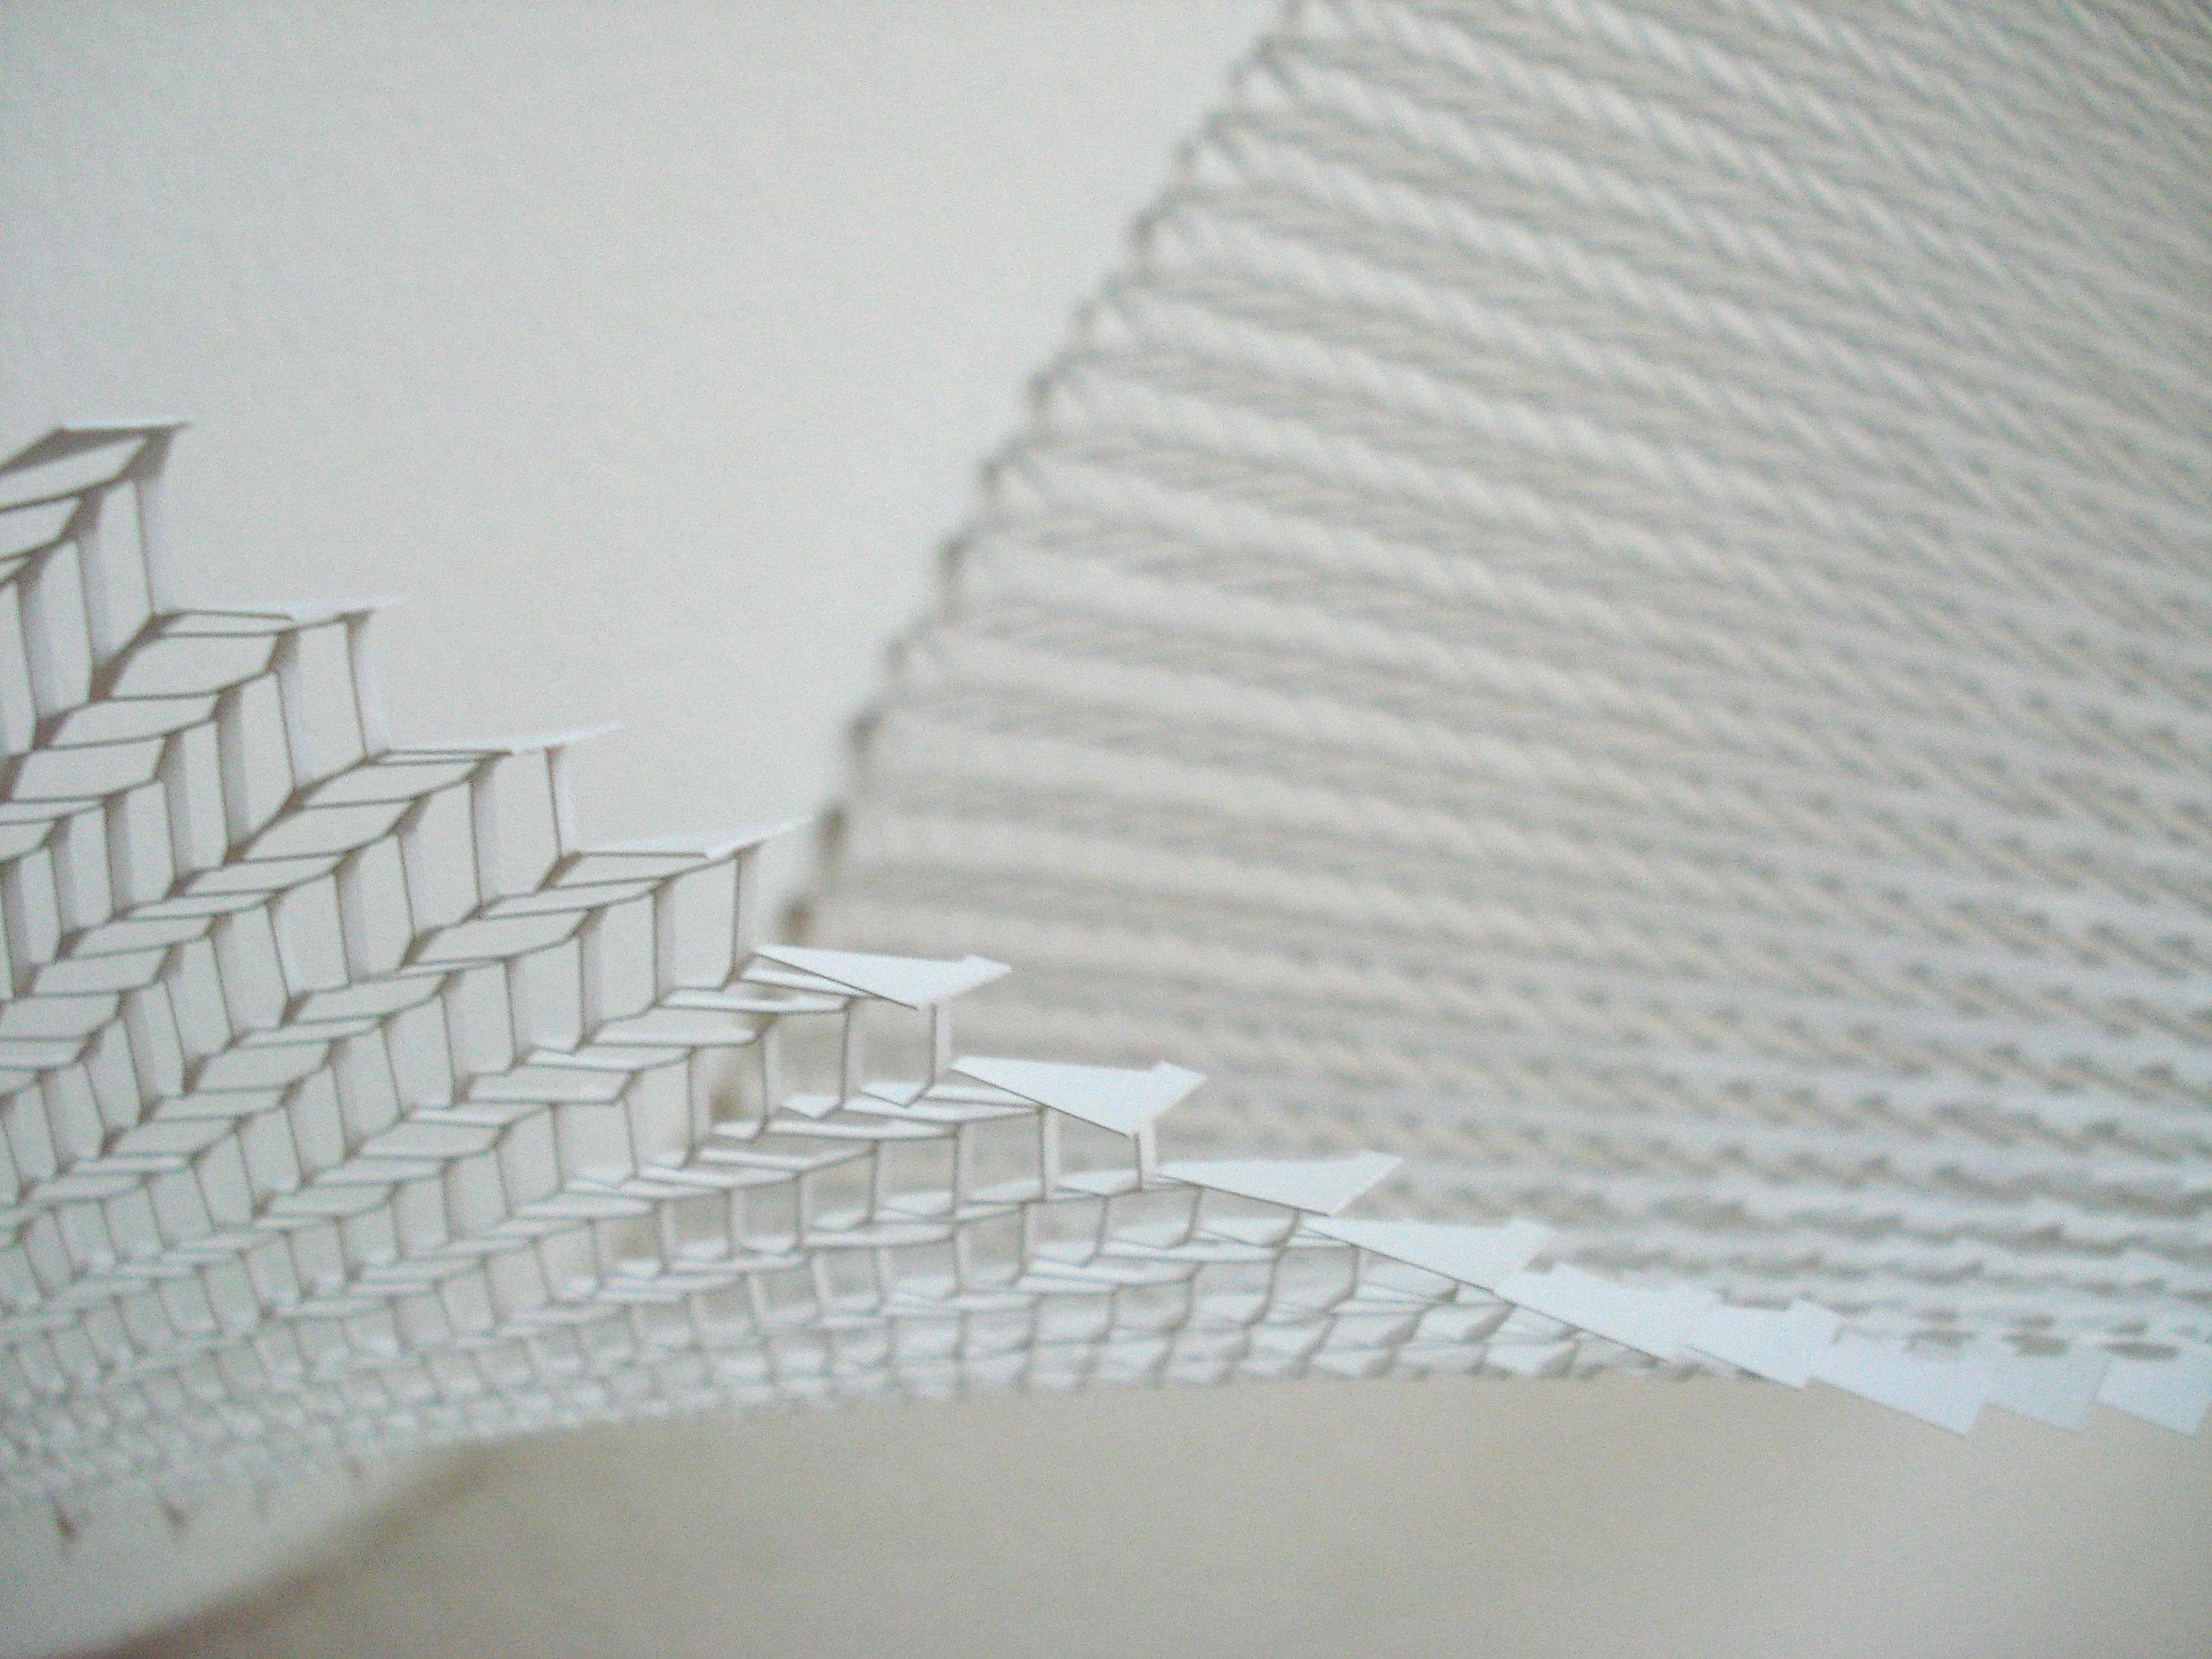 Kirigami Paper-Cutting Art Inspires a Wild Solar Energy Idea